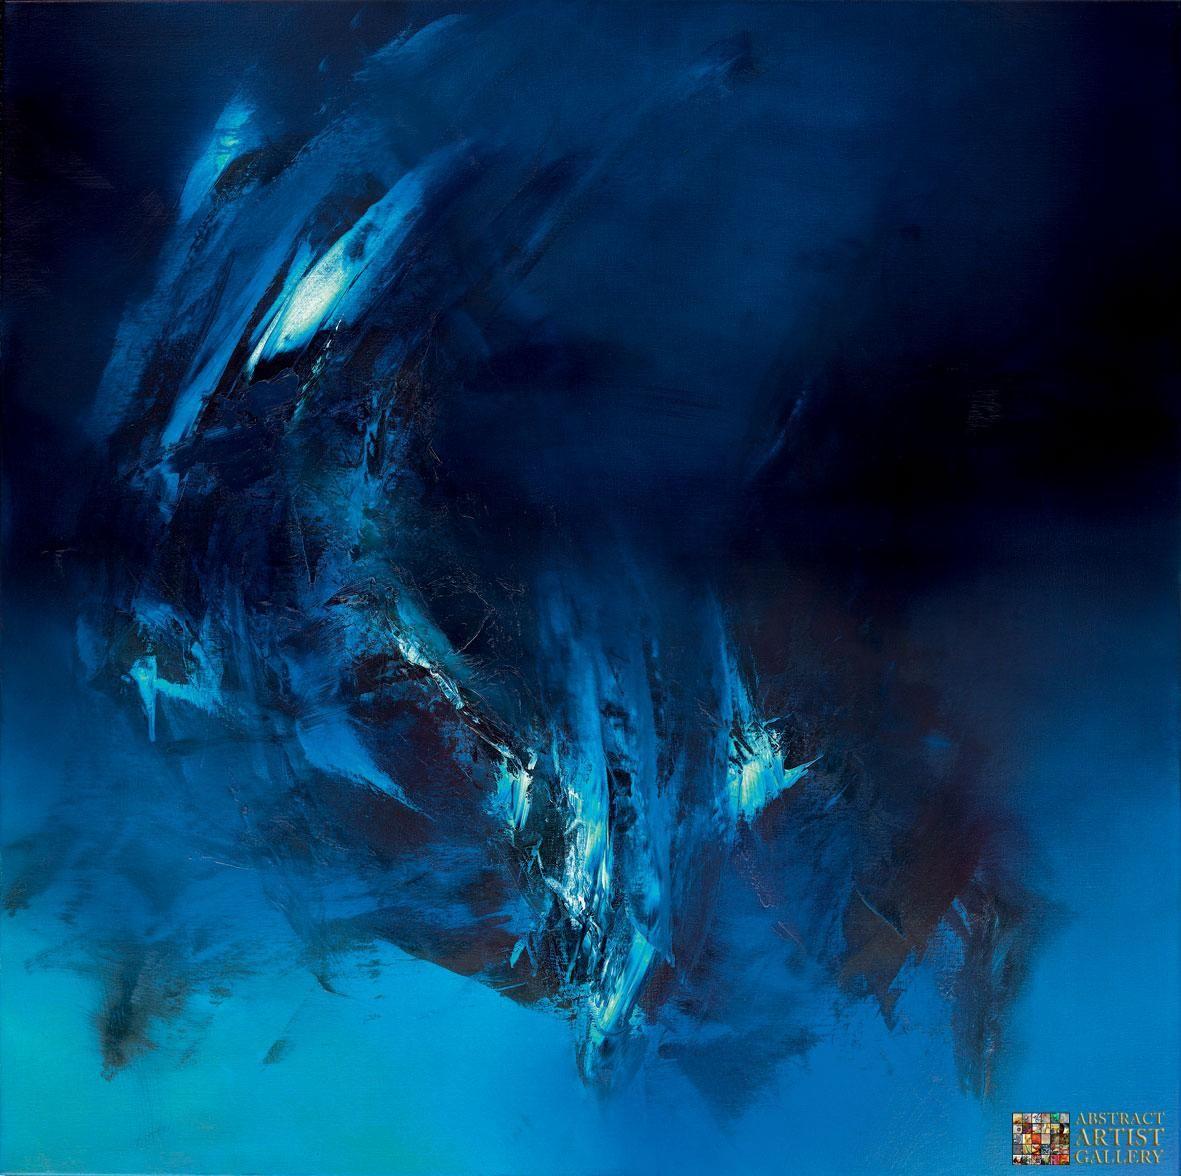 Arvee Abstract Artist Gallery